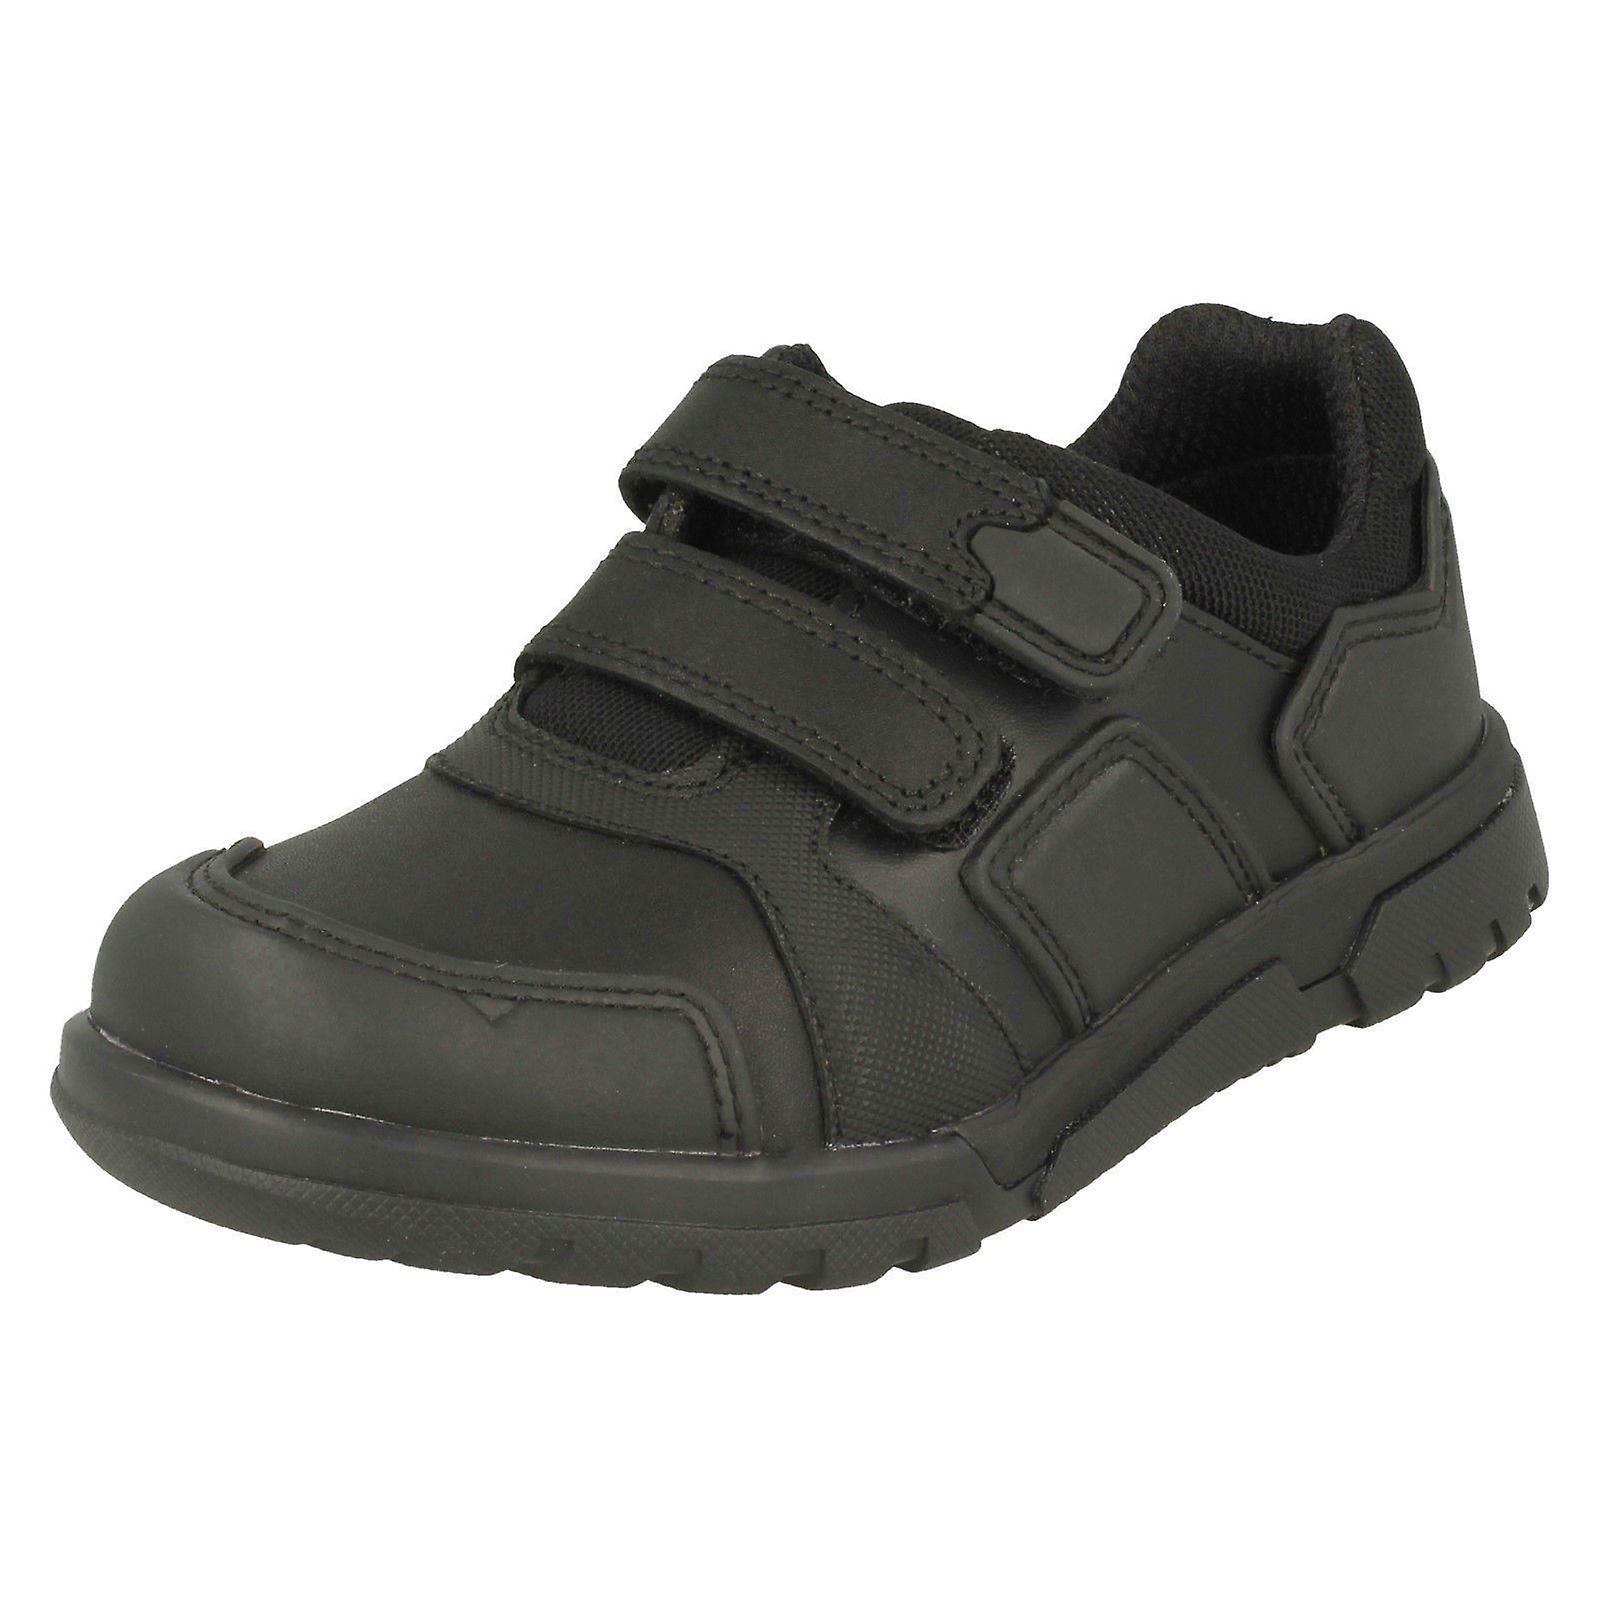 Boys Clarks Shoes Hook & Loop School Shoes Clarks Blake Street<wide range<Gentlemen/Ladies 835e0b